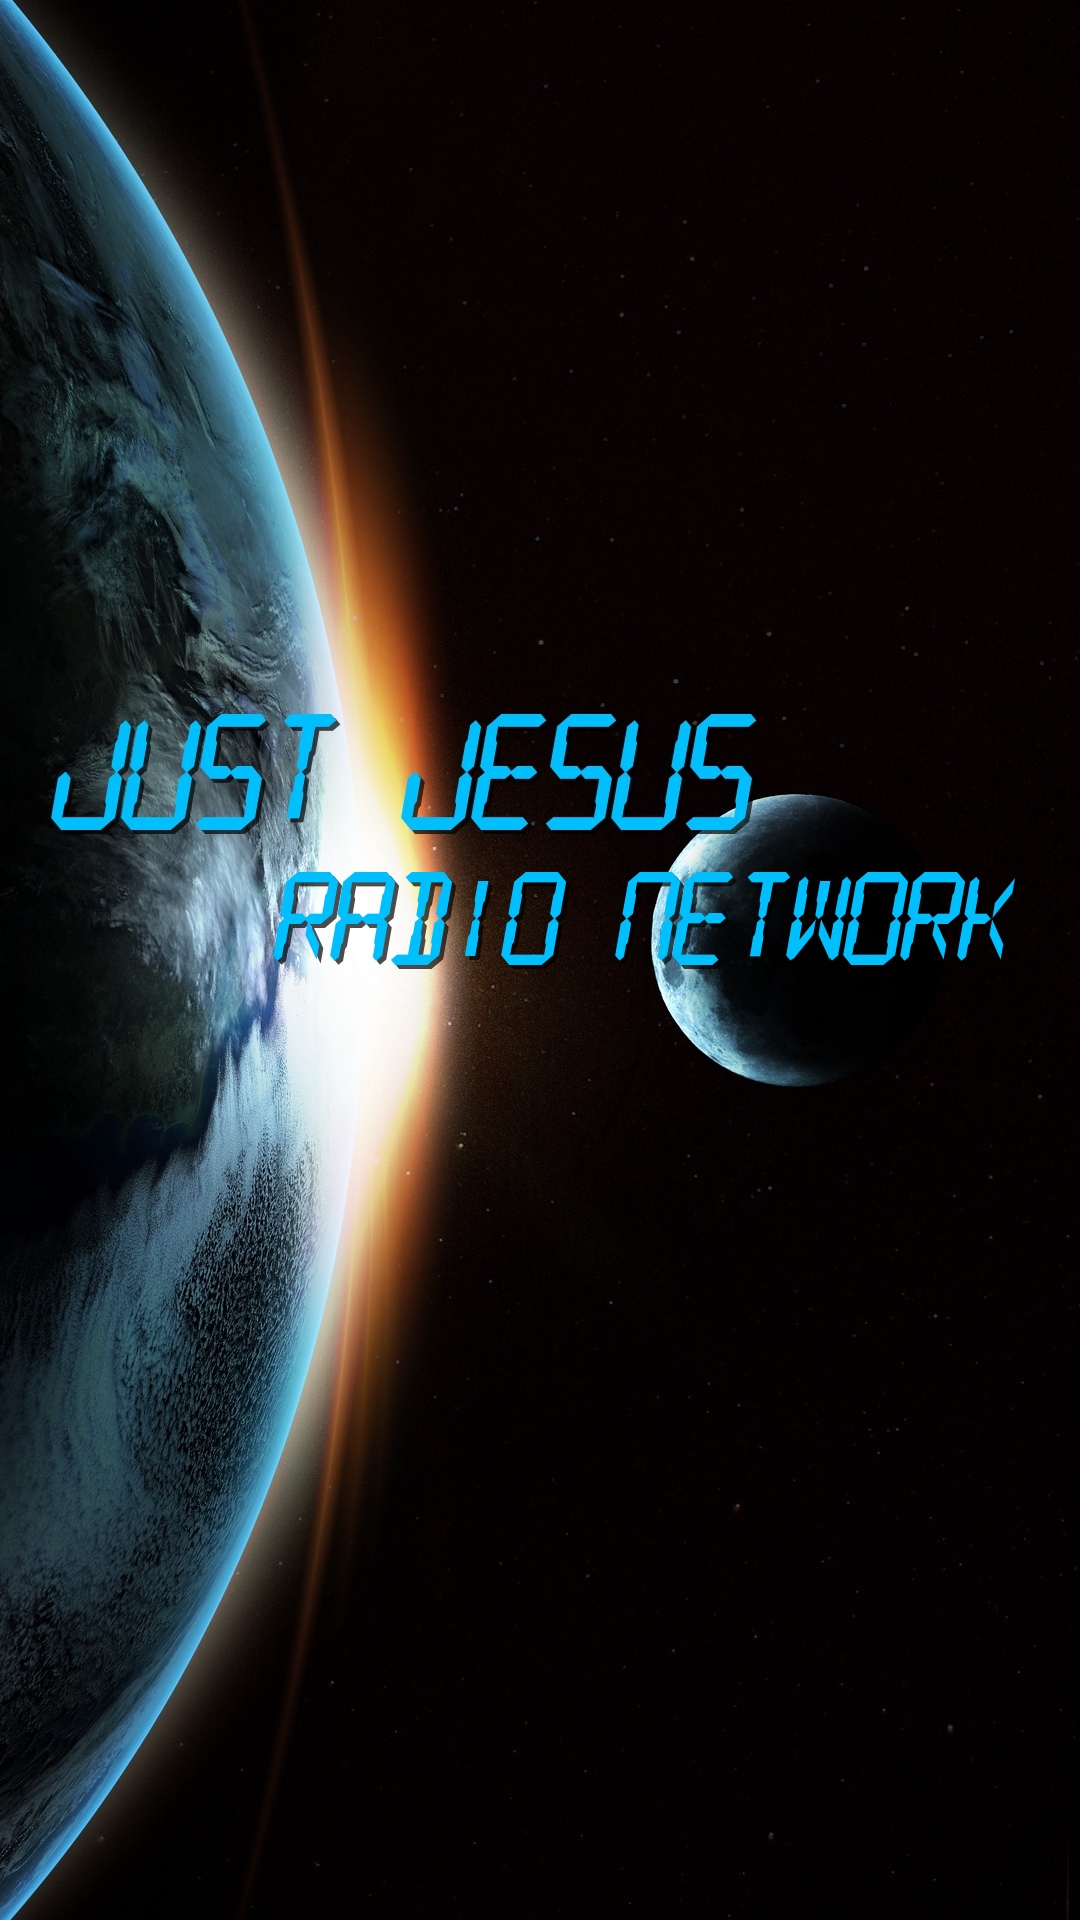 Just Jesus Radio Network